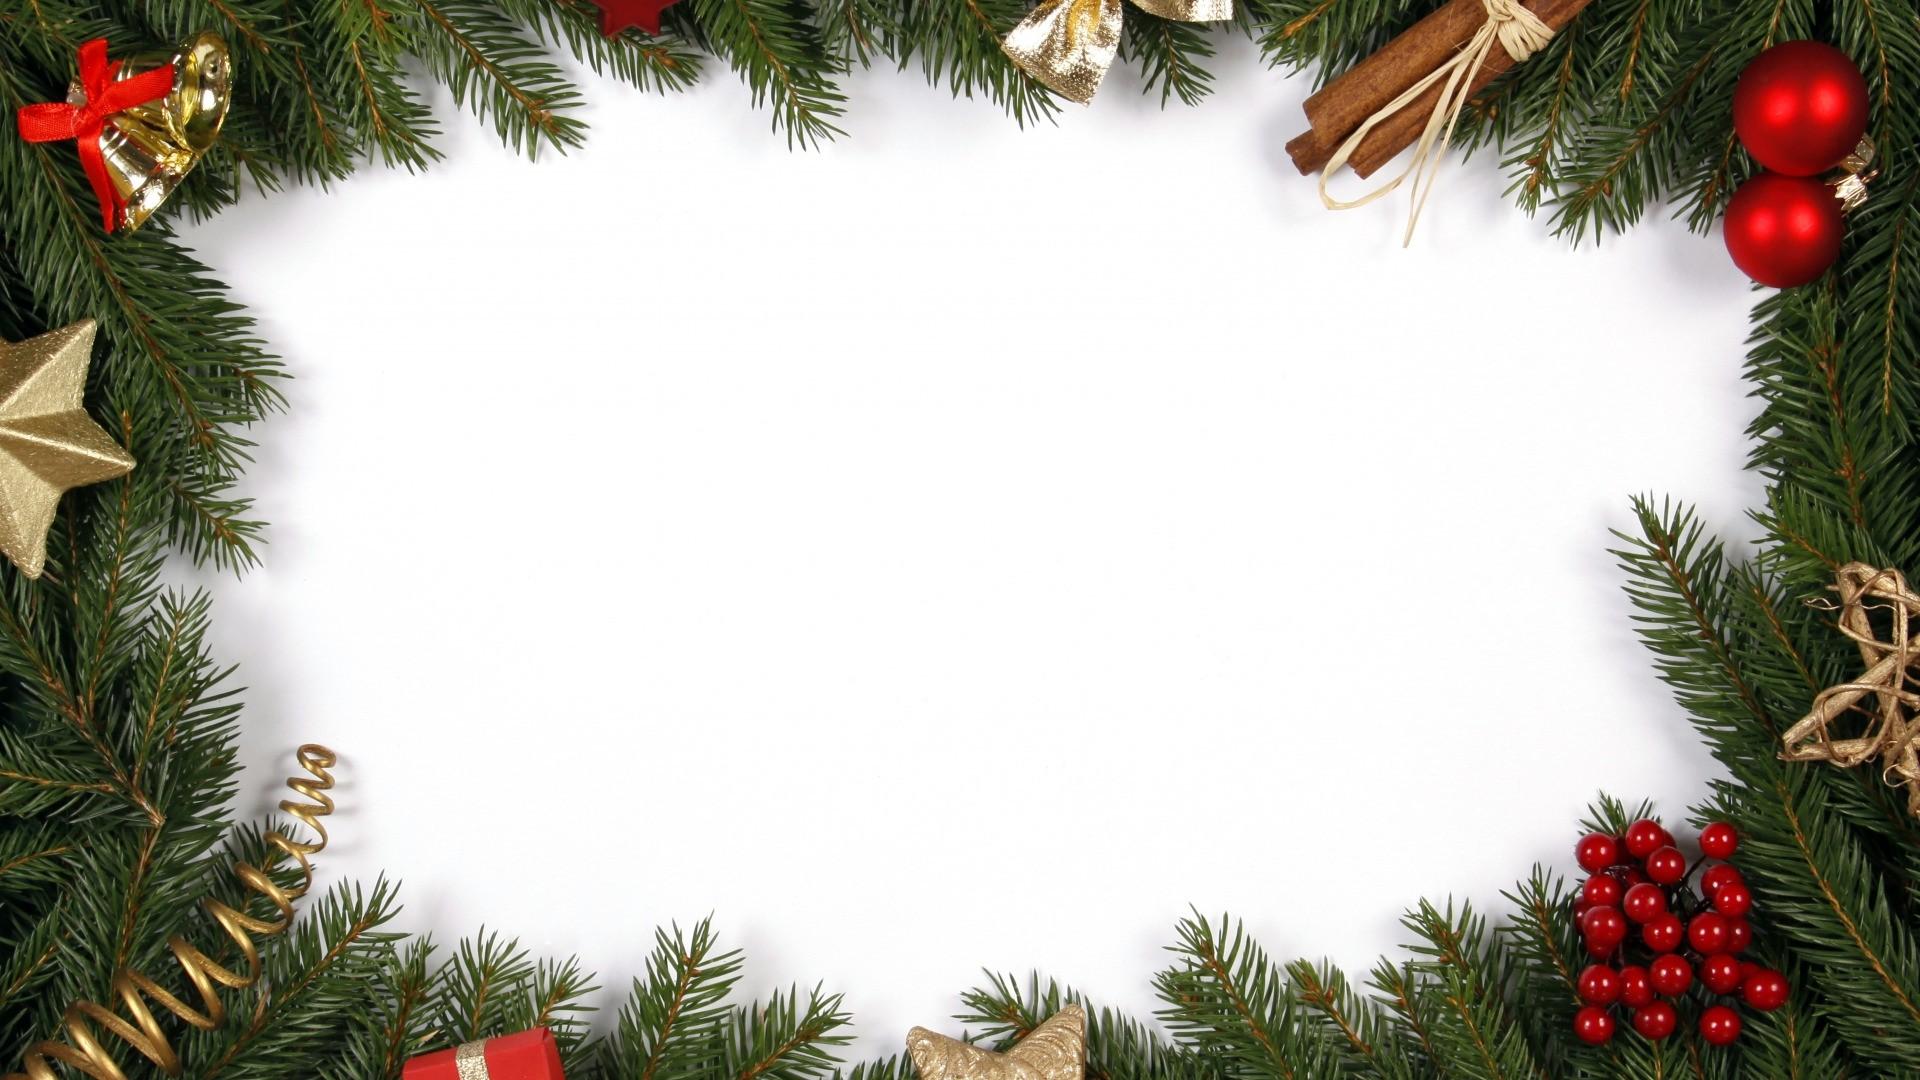 New Year Branch Frame HD Wallpaper